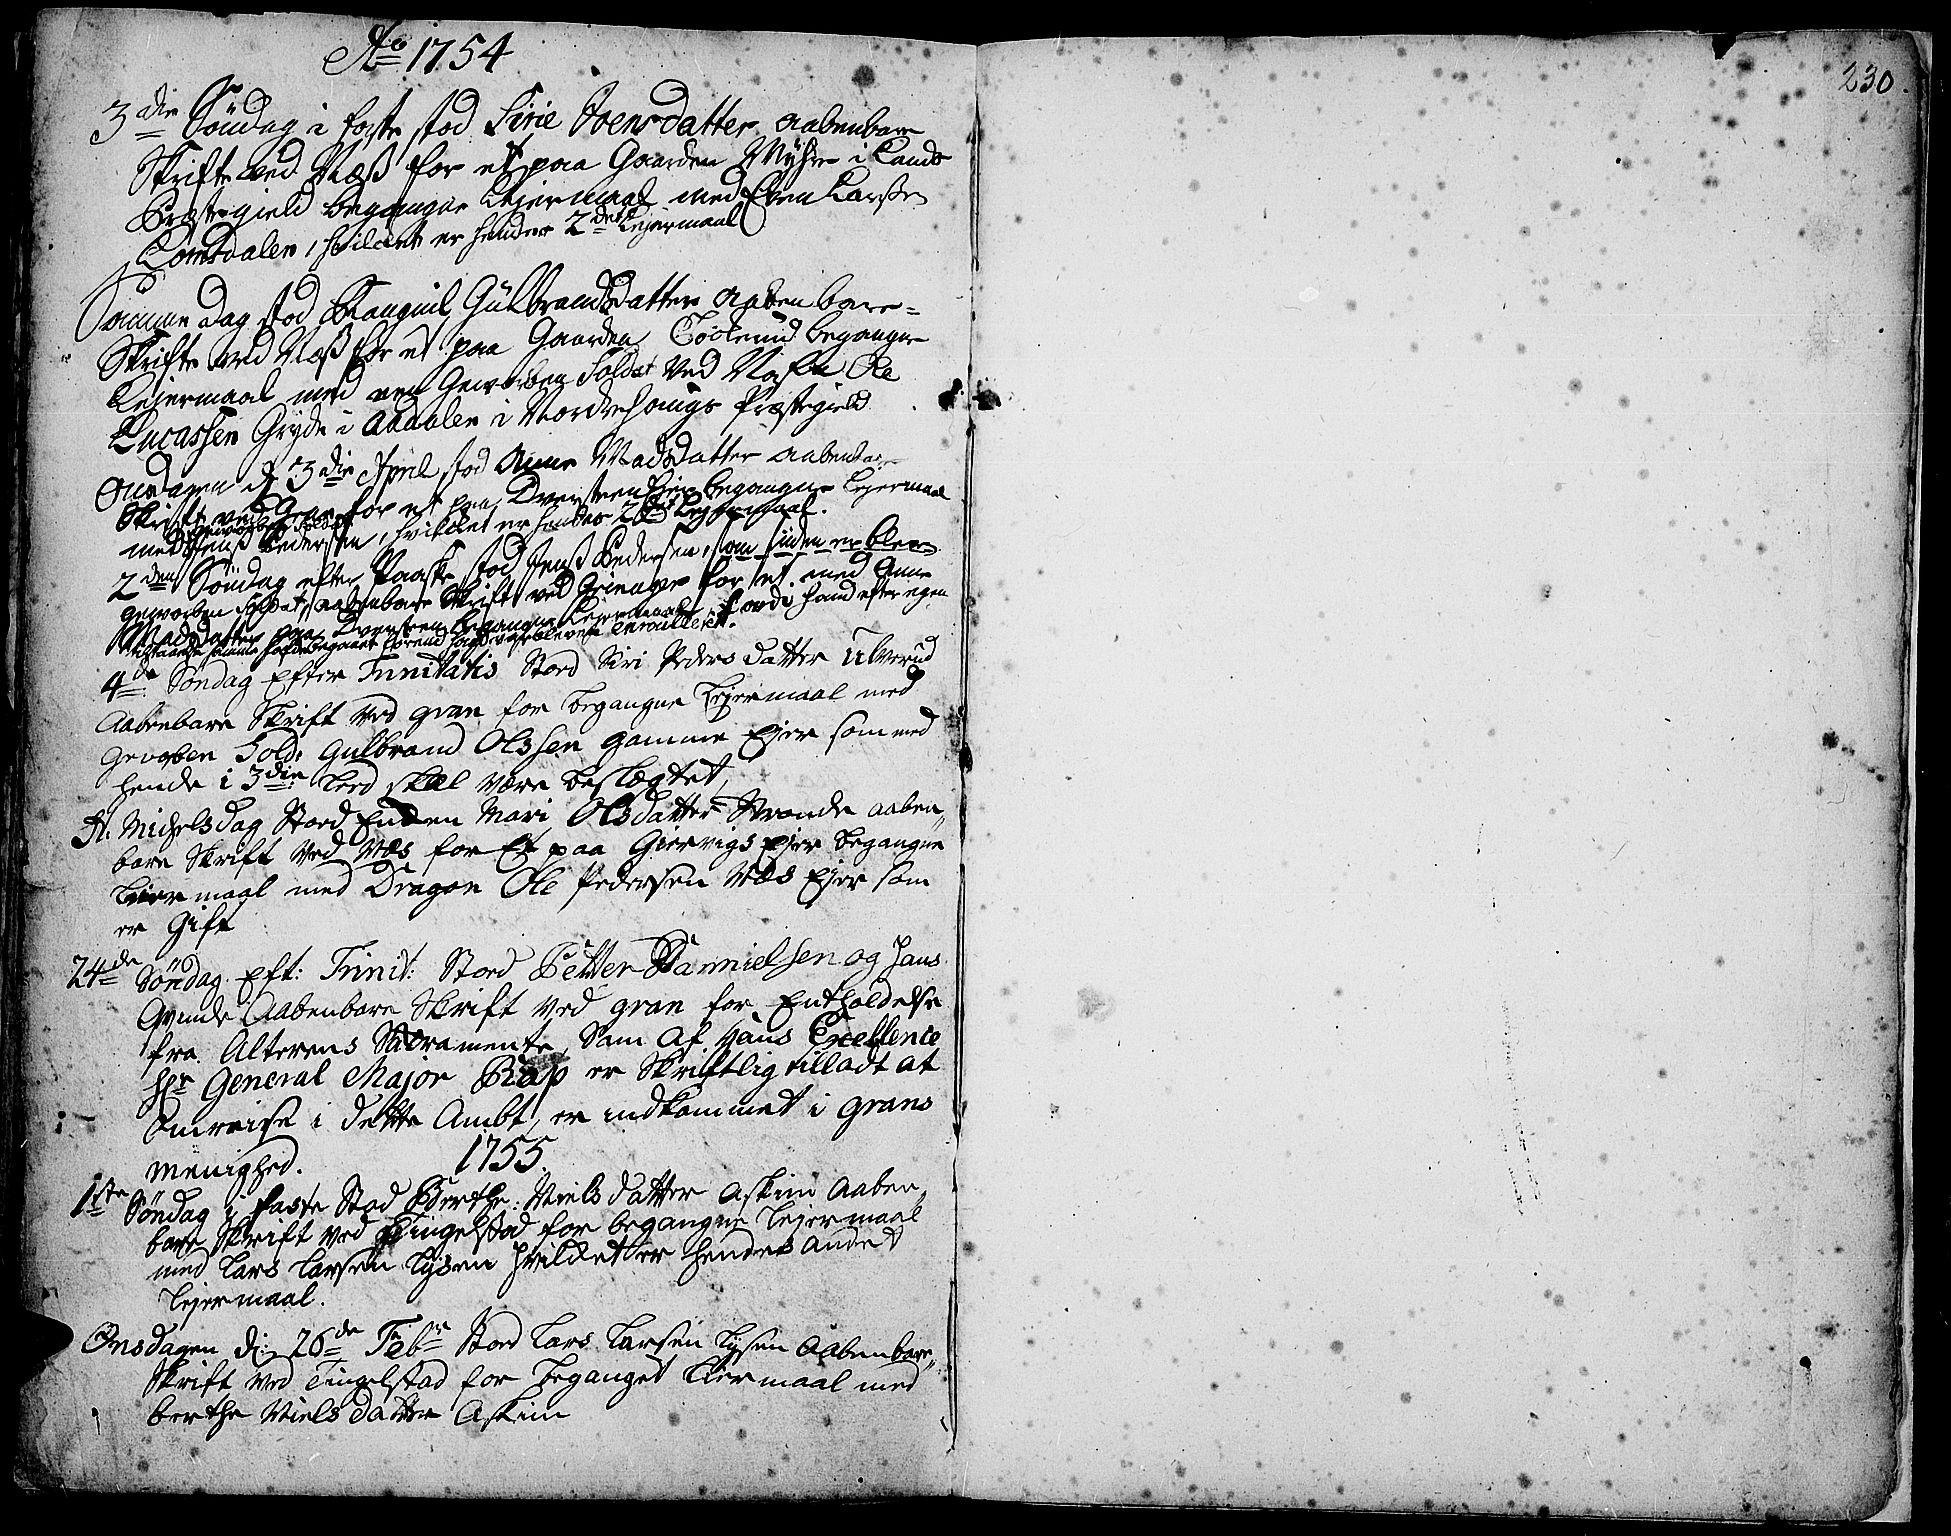 SAH, Gran prestekontor, Ministerialbok nr. 3, 1745-1758, s. 230